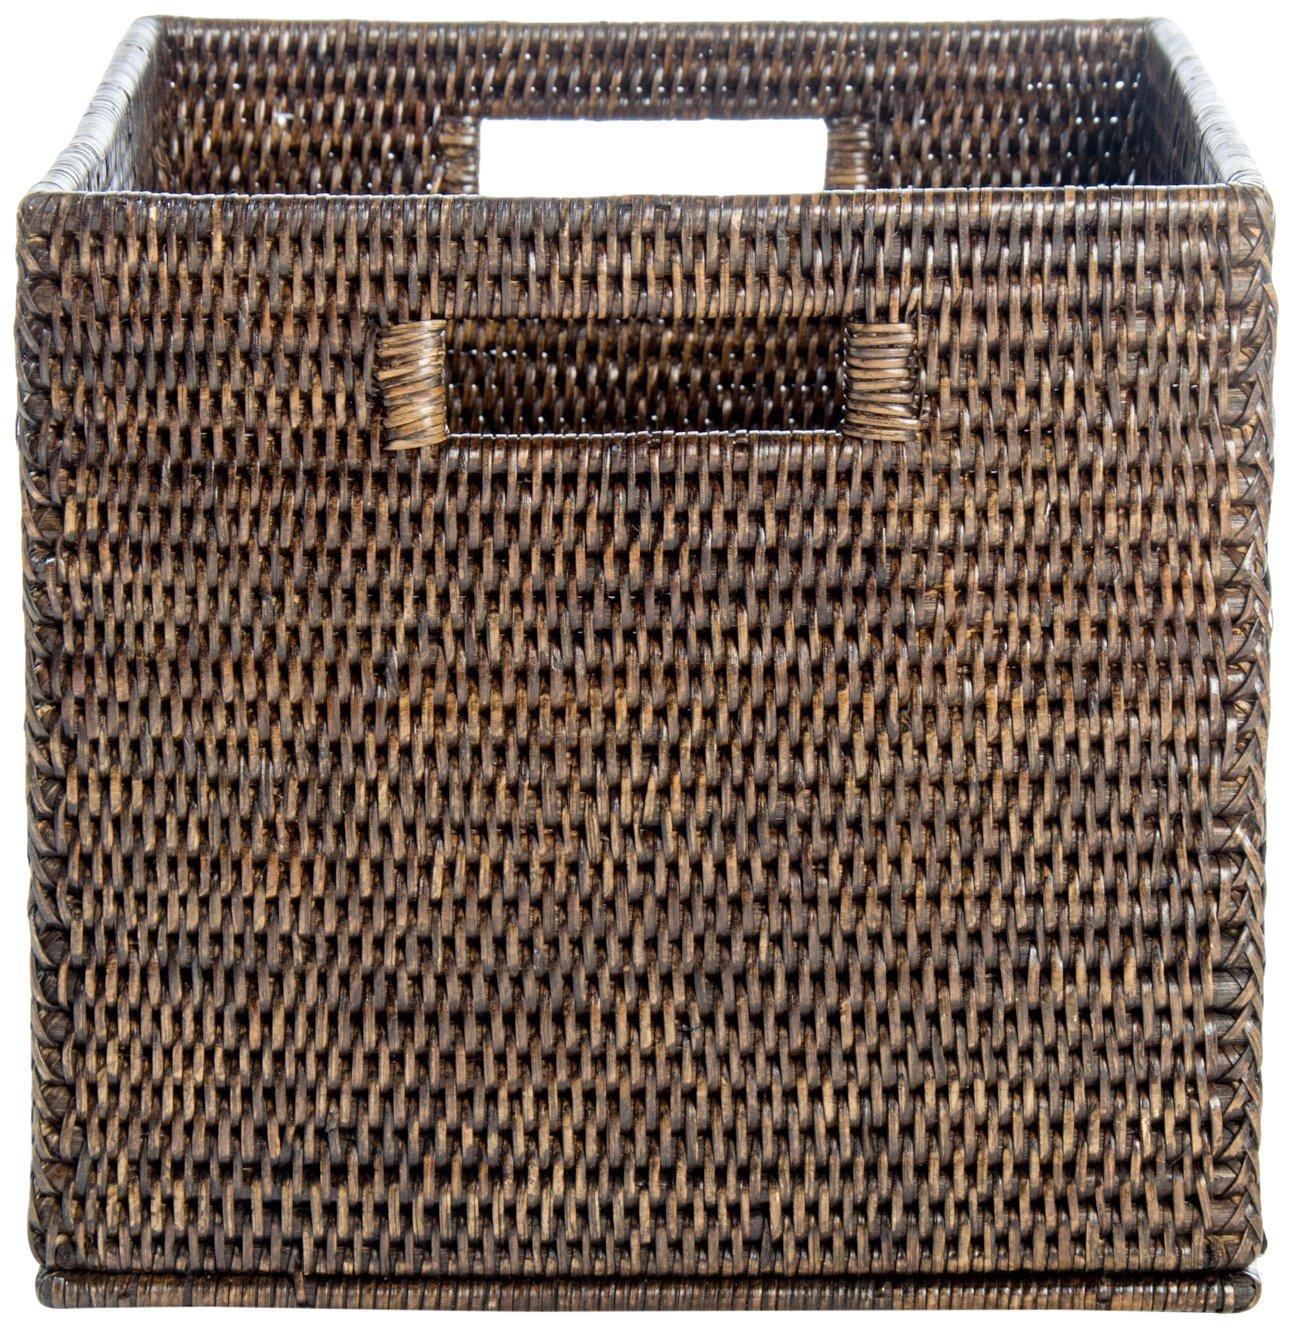 Artifacts Rattan Storage Basket with Cutout Handles